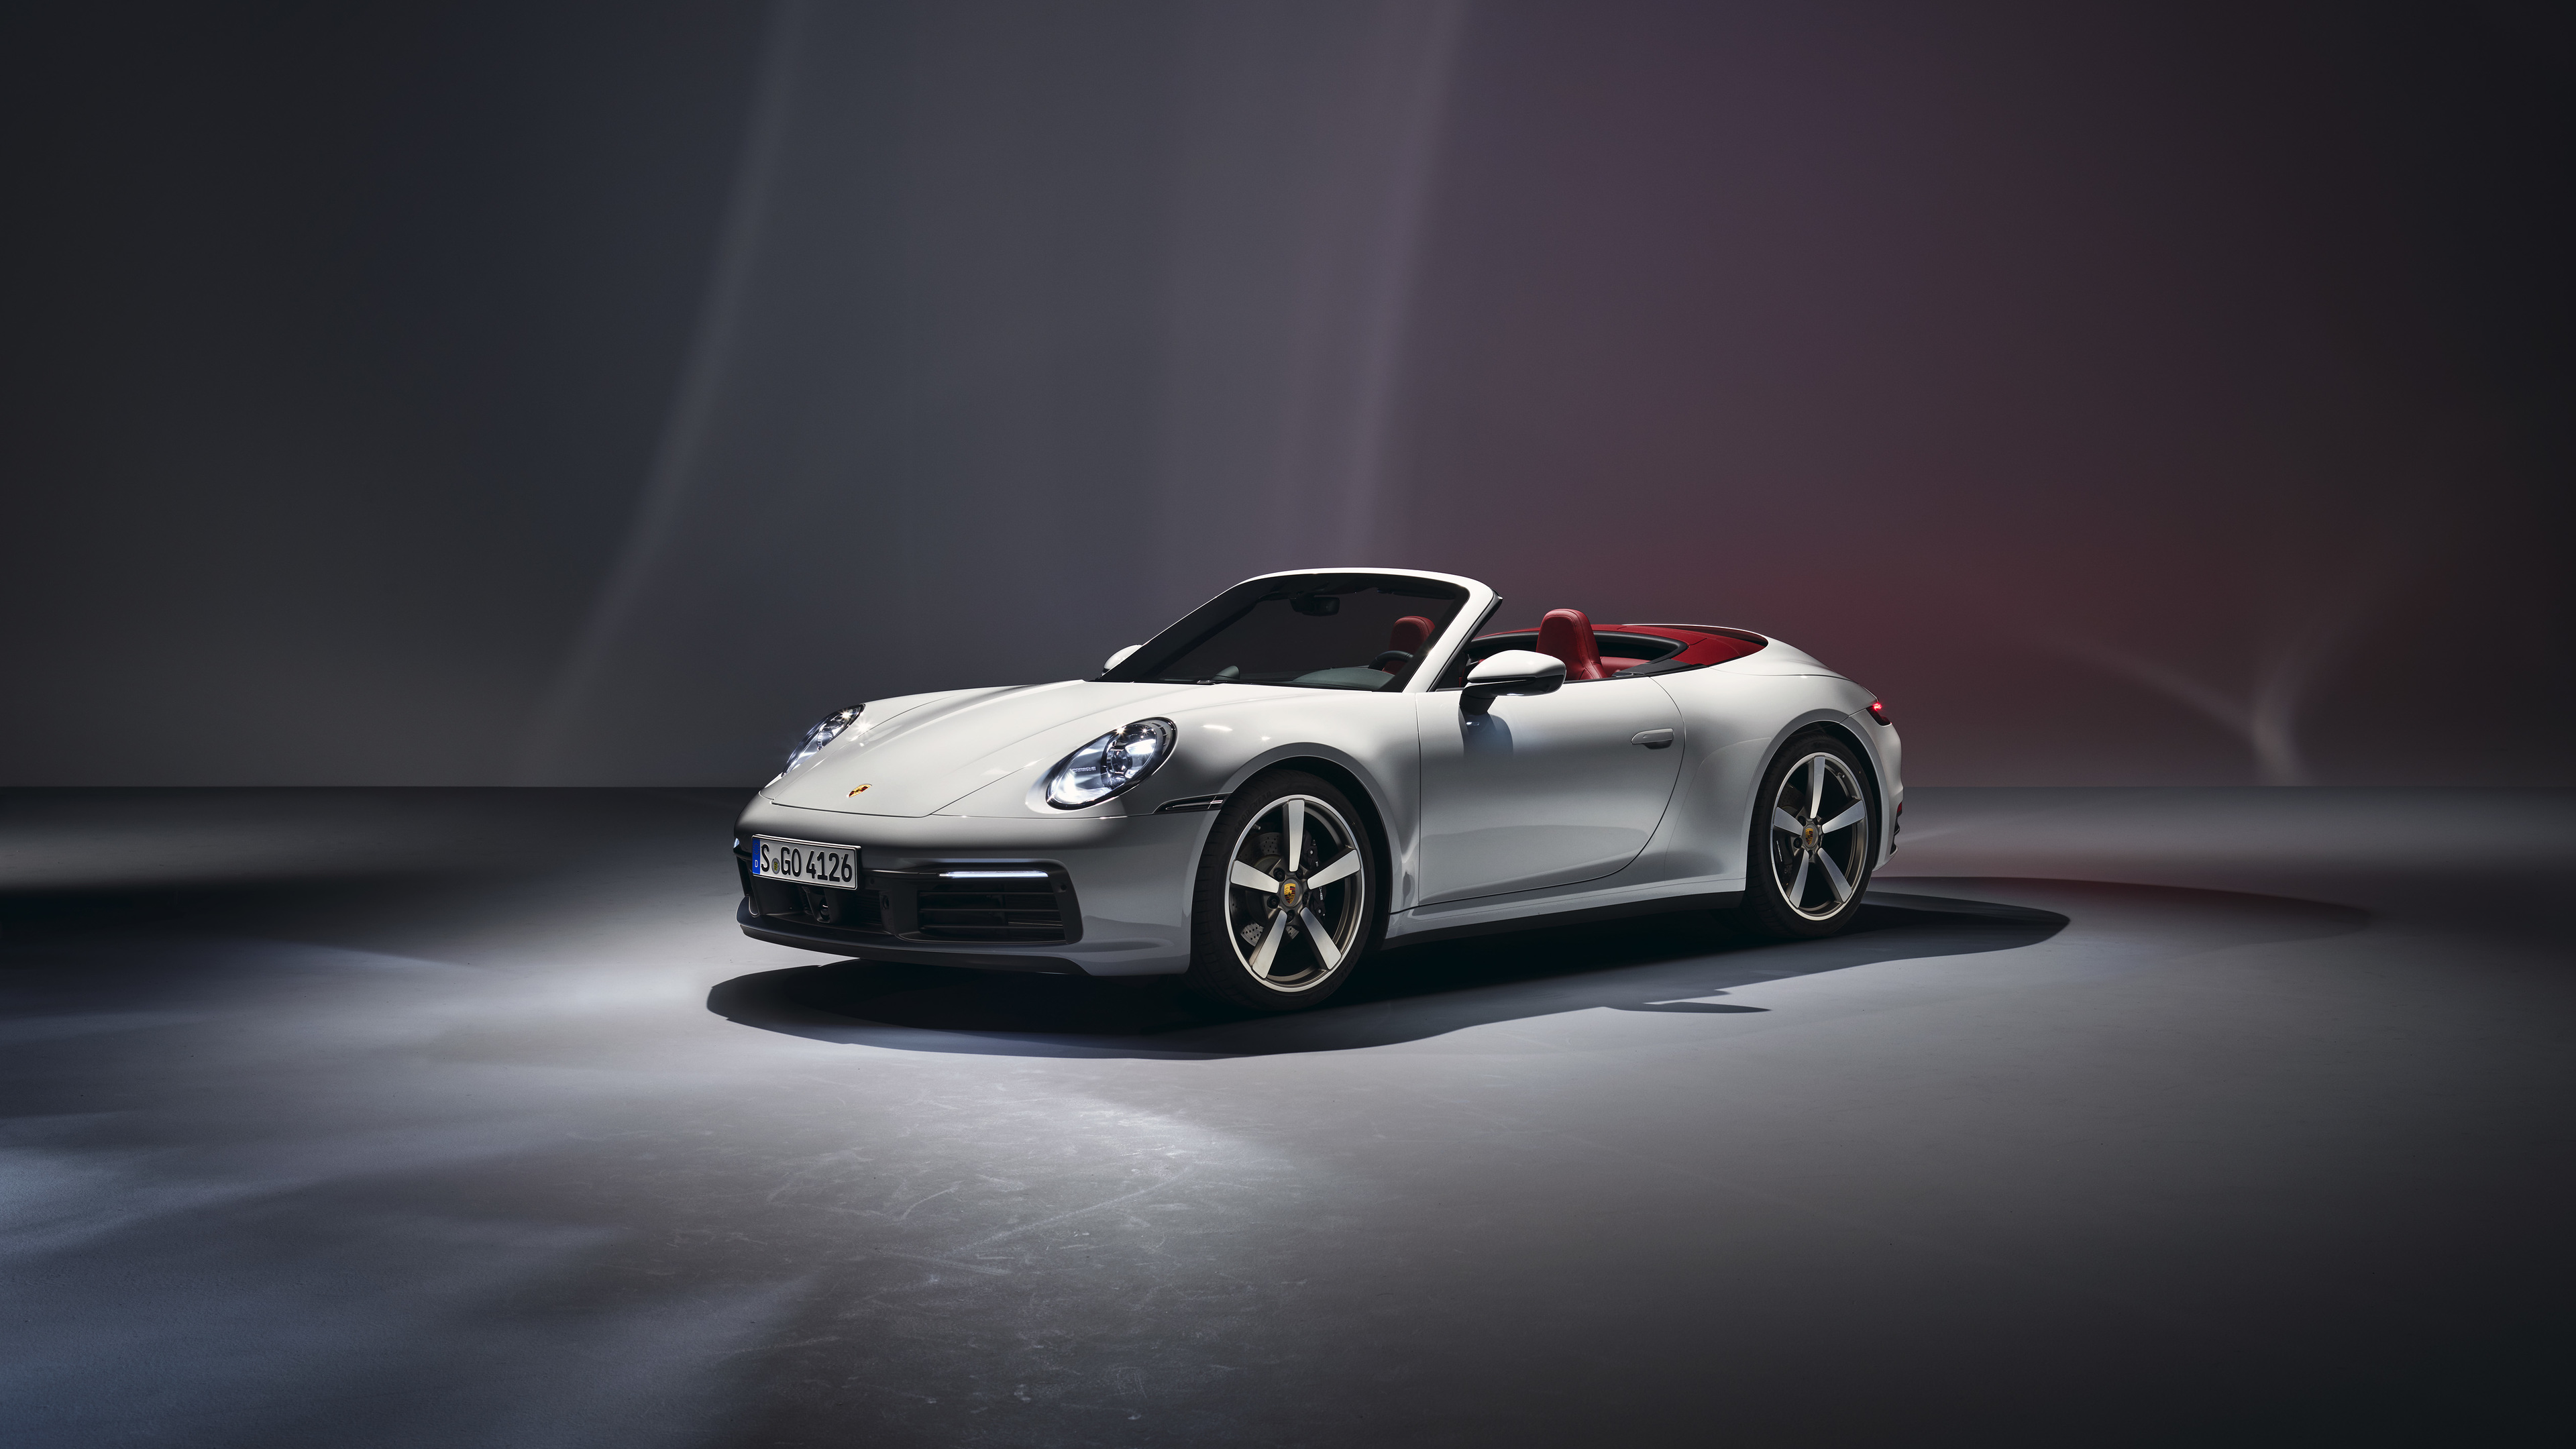 porsche 911 carrera cabriolet 2019 1569188372 - Porsche 911 Carrera Cabriolet 2019 - porsche wallpapers, porsche carrera wallpapers, hd-wallpapers, cars wallpapers, 4k-wallpapers, 2019 cars wallpapers